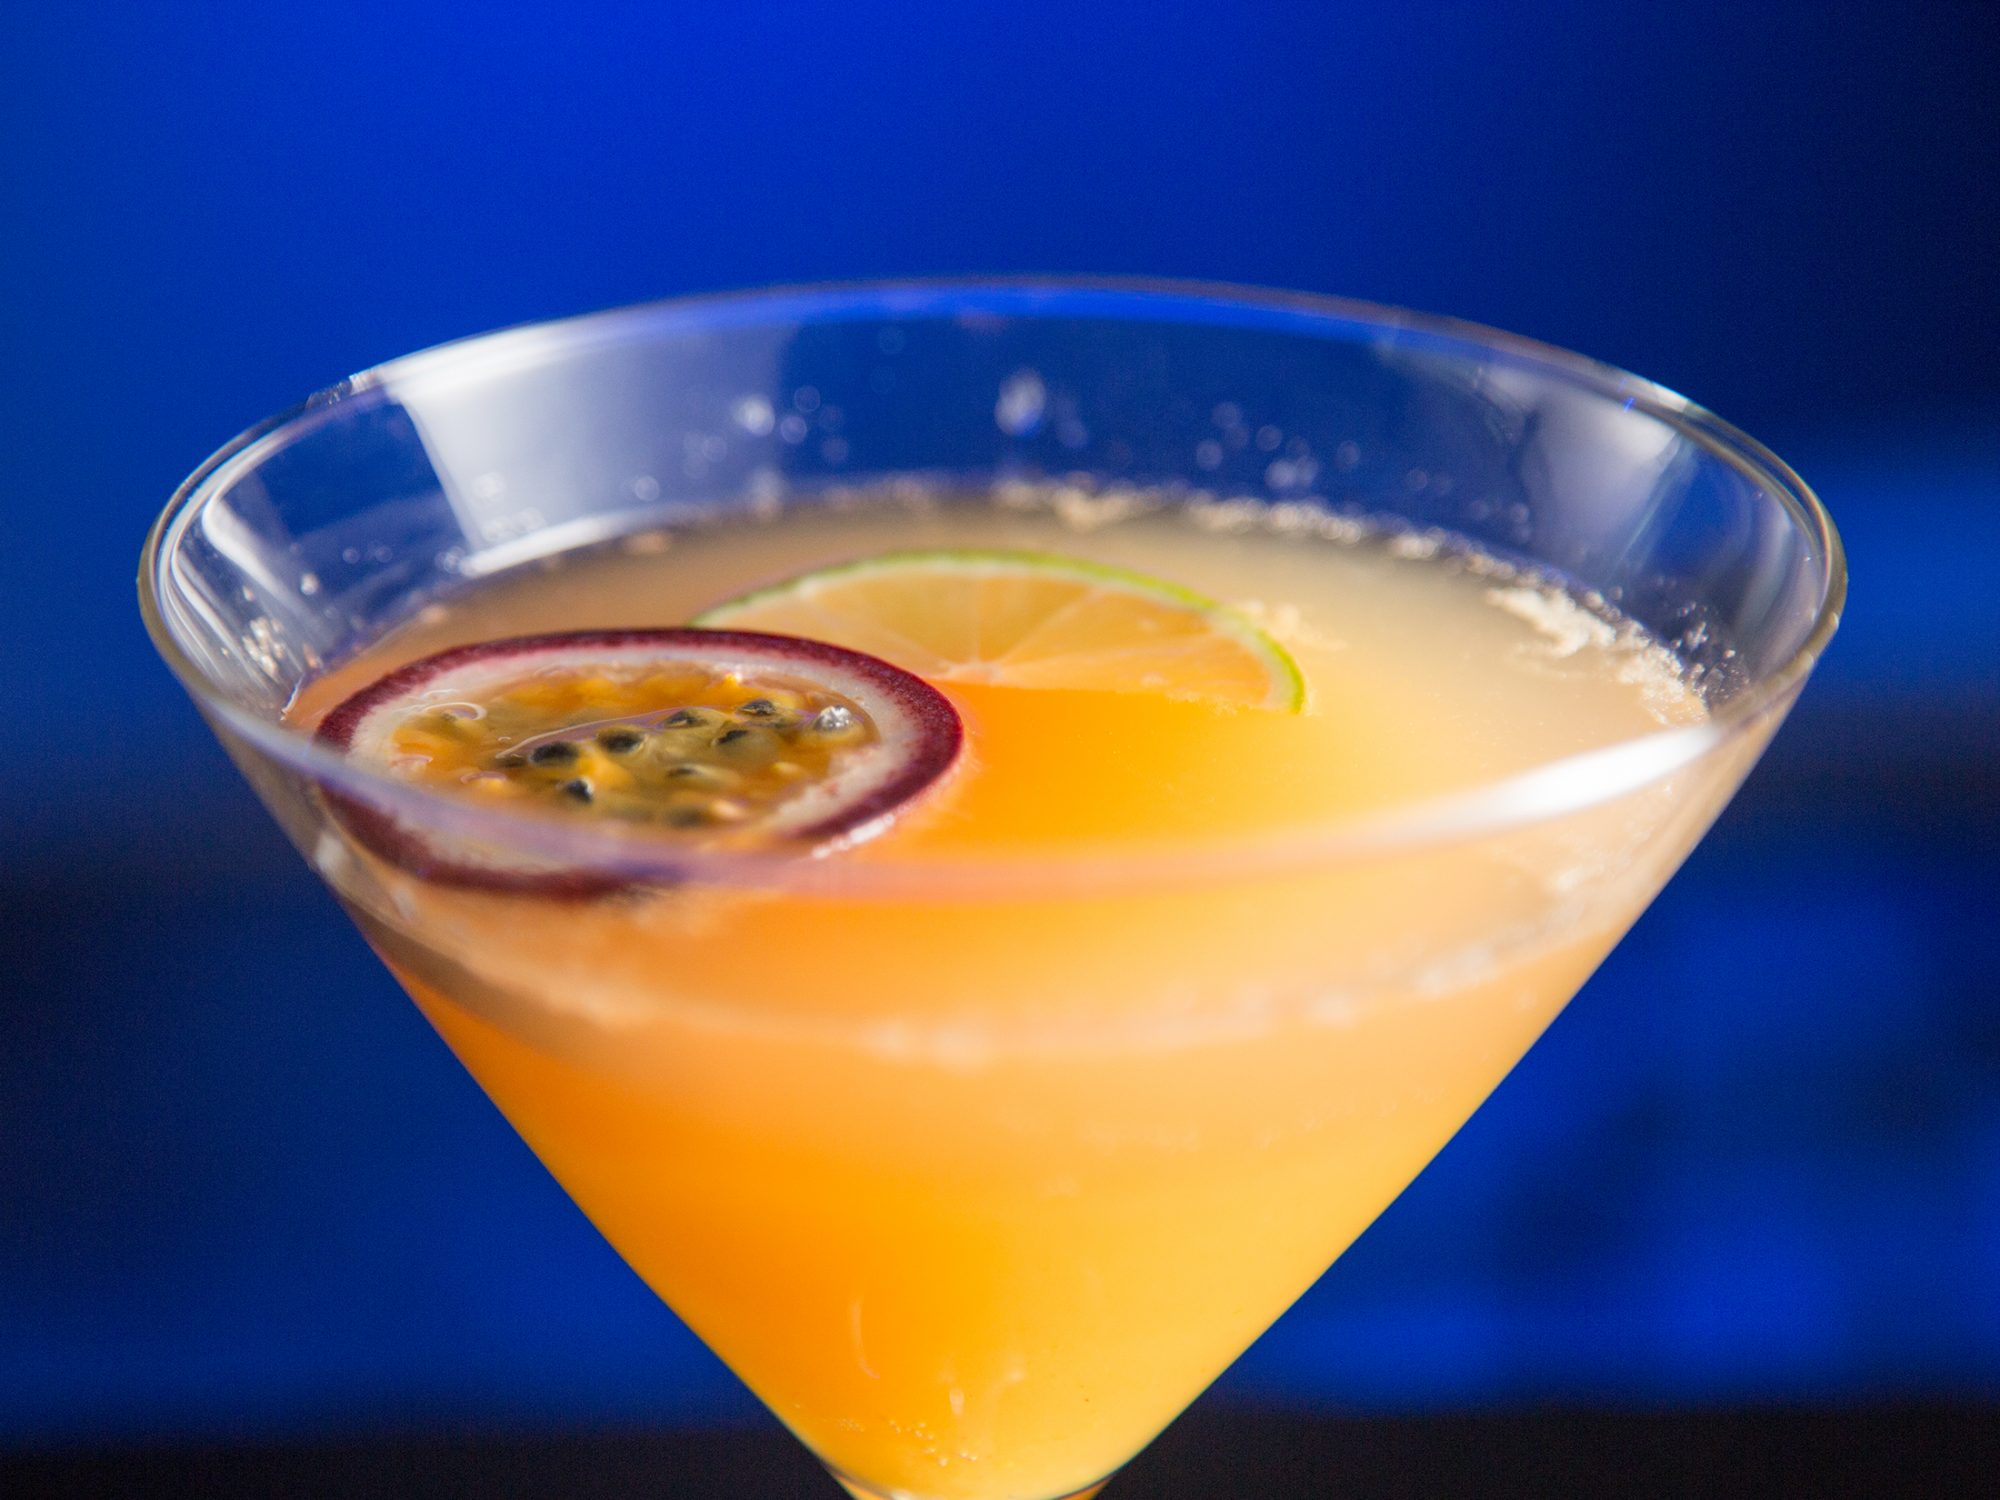 porn-star-martini-DCMS-Large.jpg